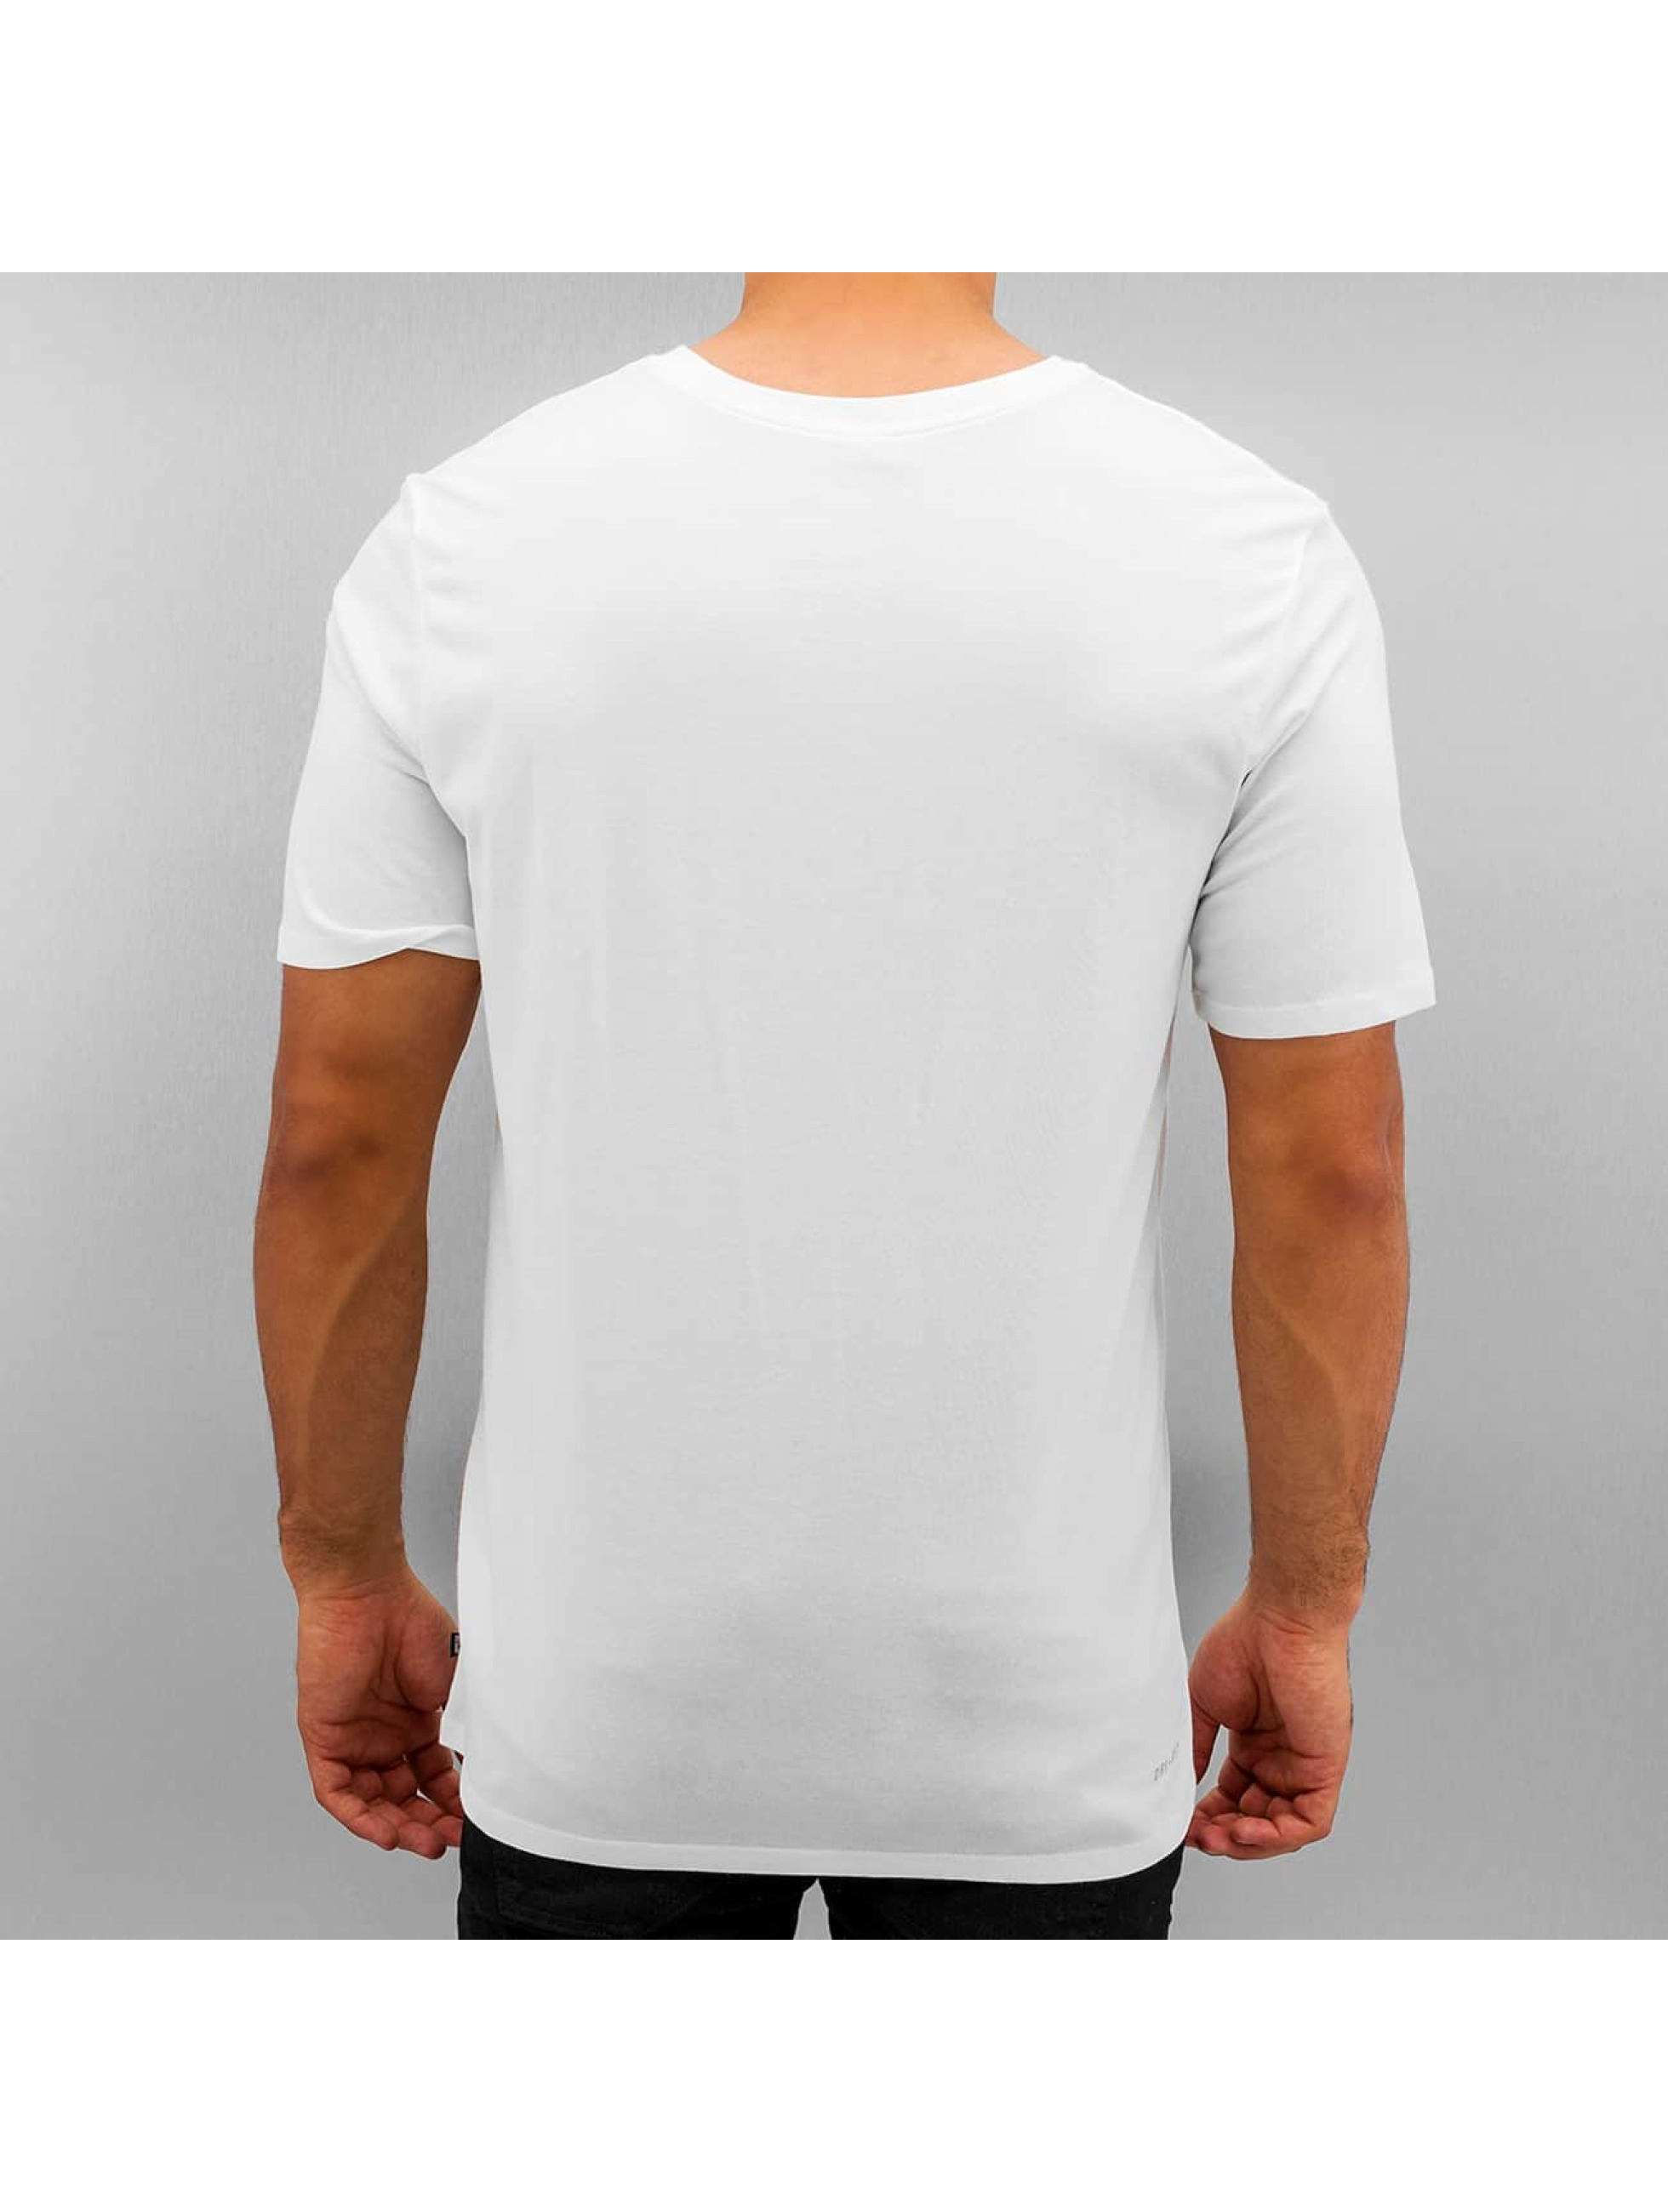 Nike SB T-Shirt SB Logo weiß